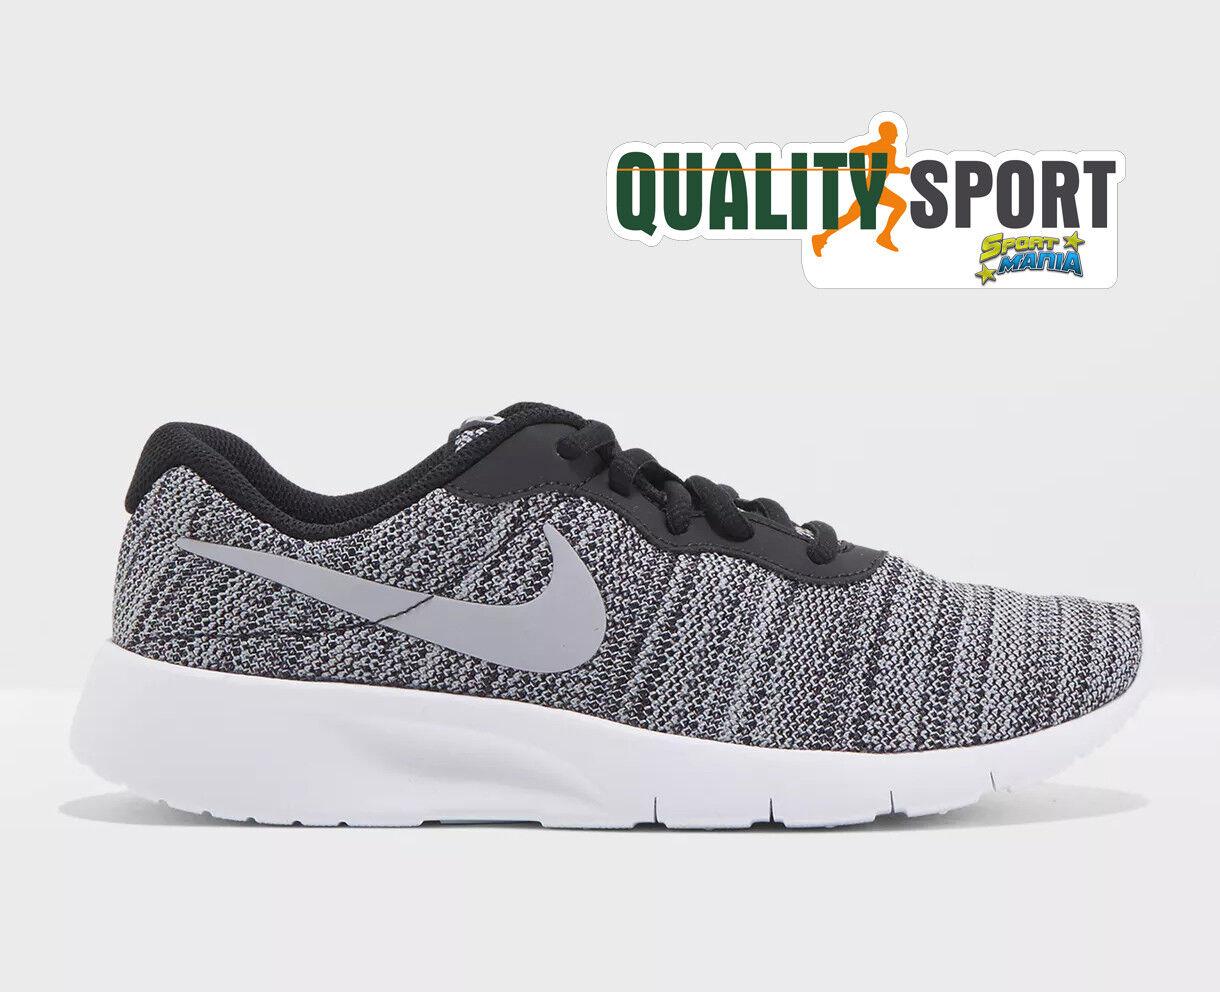 Nike Tanjun Nero Grigio Scarpe Chaussures Donna Ragazzo Baskets 818381 019 2018